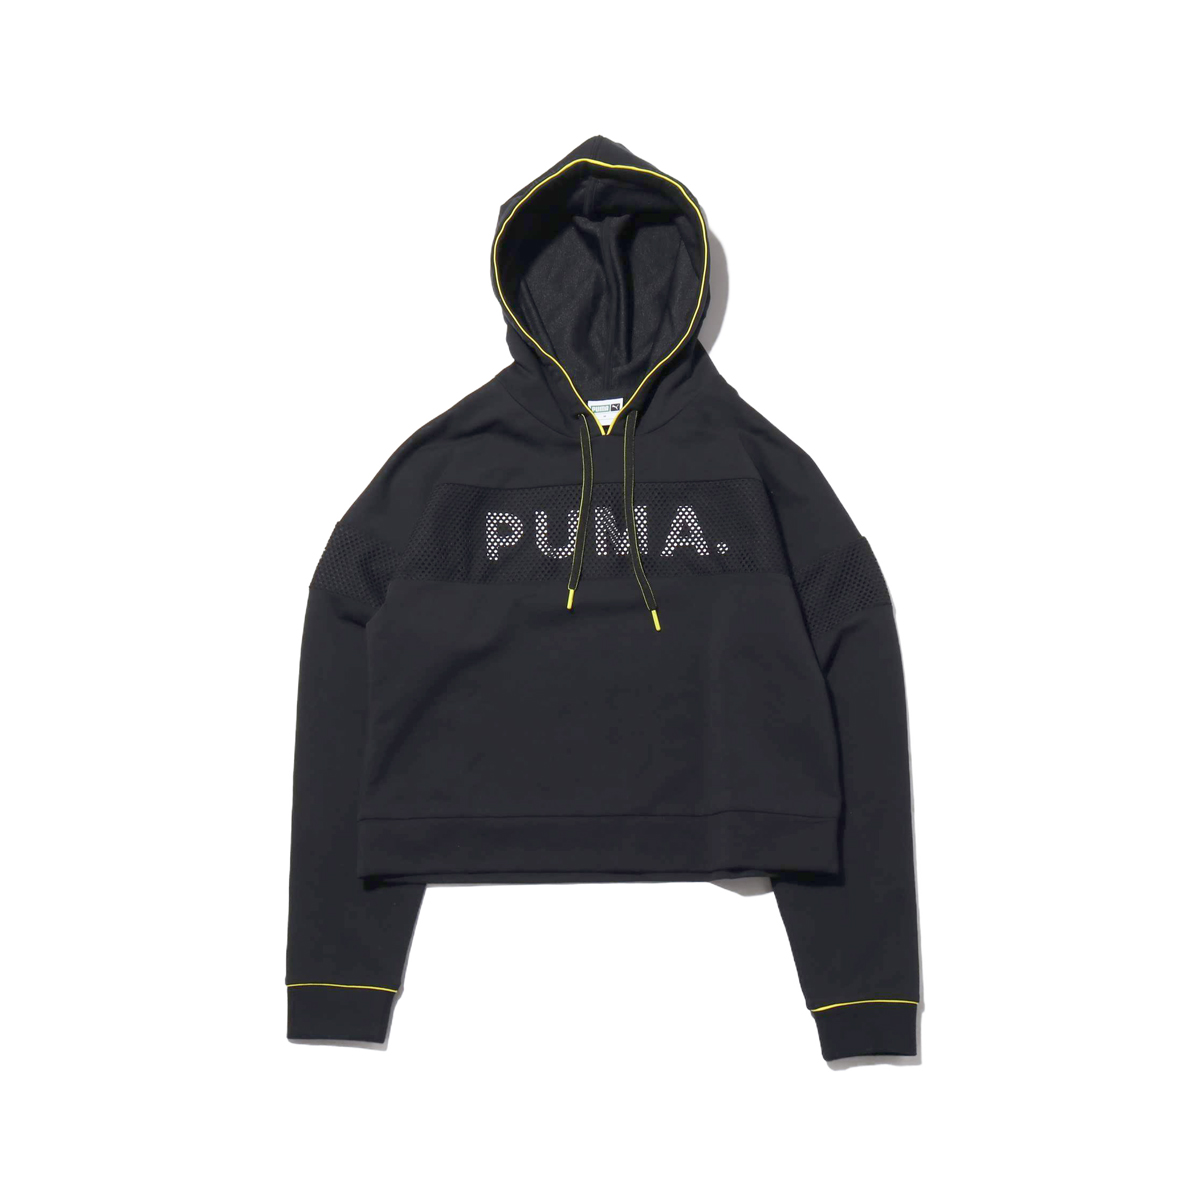 PUMA CHASE HOODY(プーマ チェース フーディー)COTTON BLACK【レディース パーカー】19SP-I